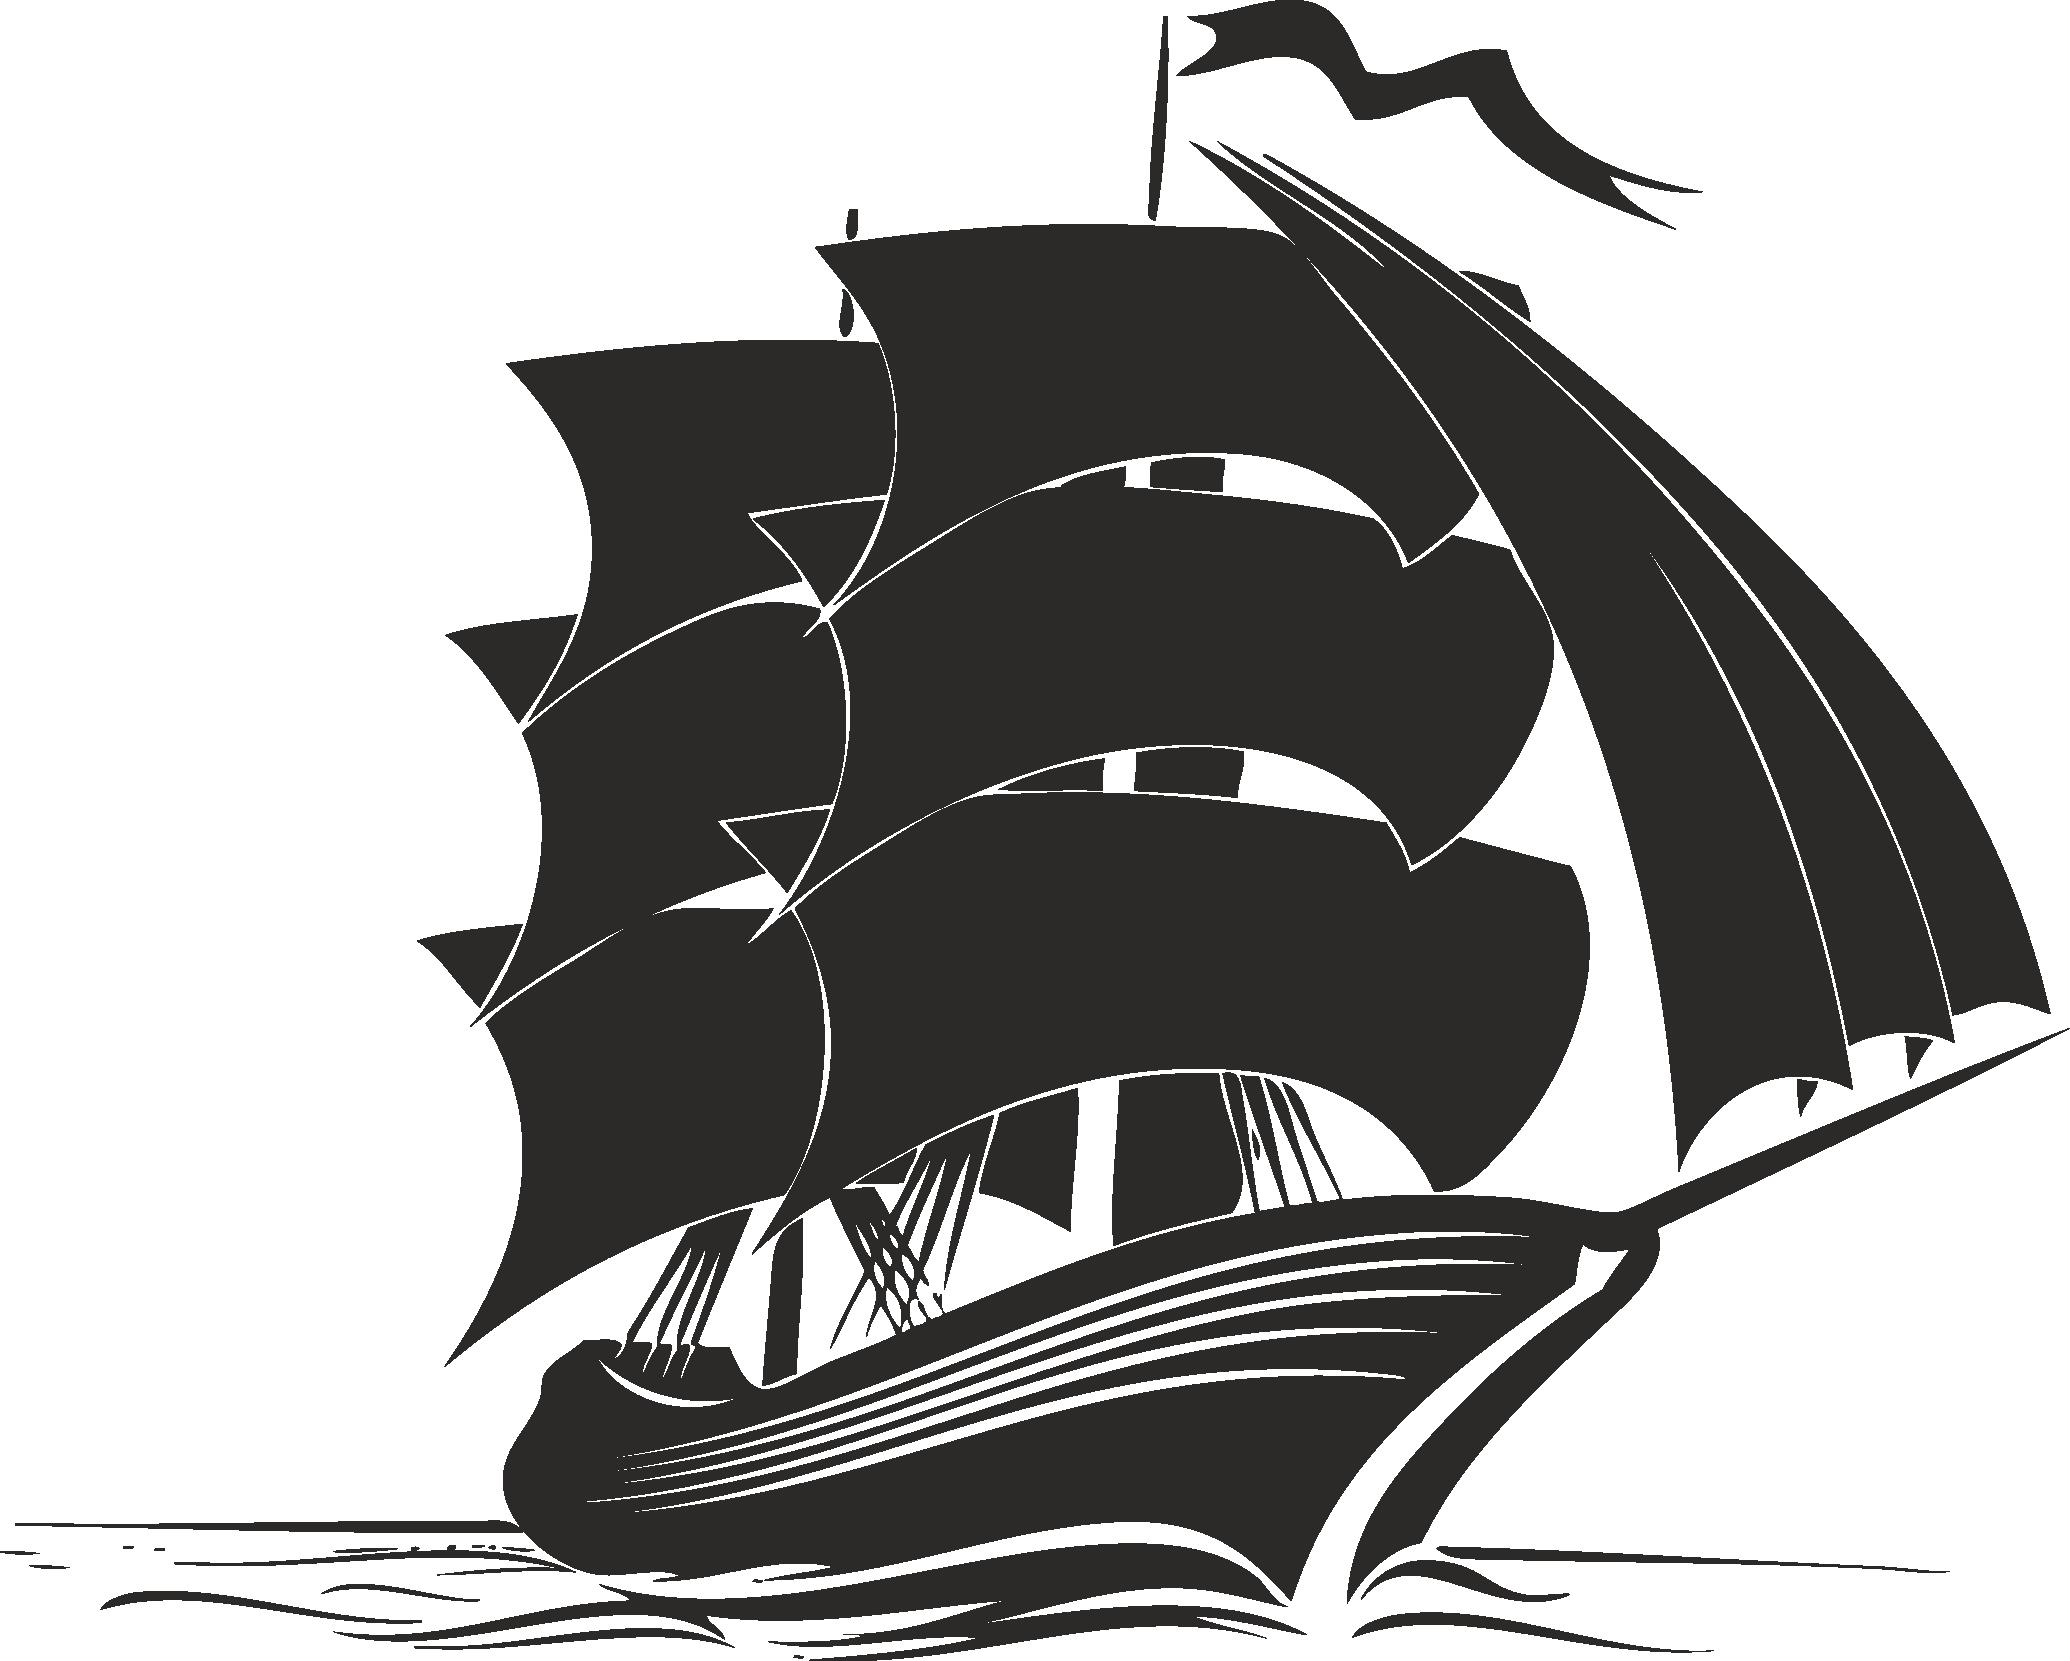 Sailboat Beautiful Silhouettes Of Sailing Ships 11 Free DXF File